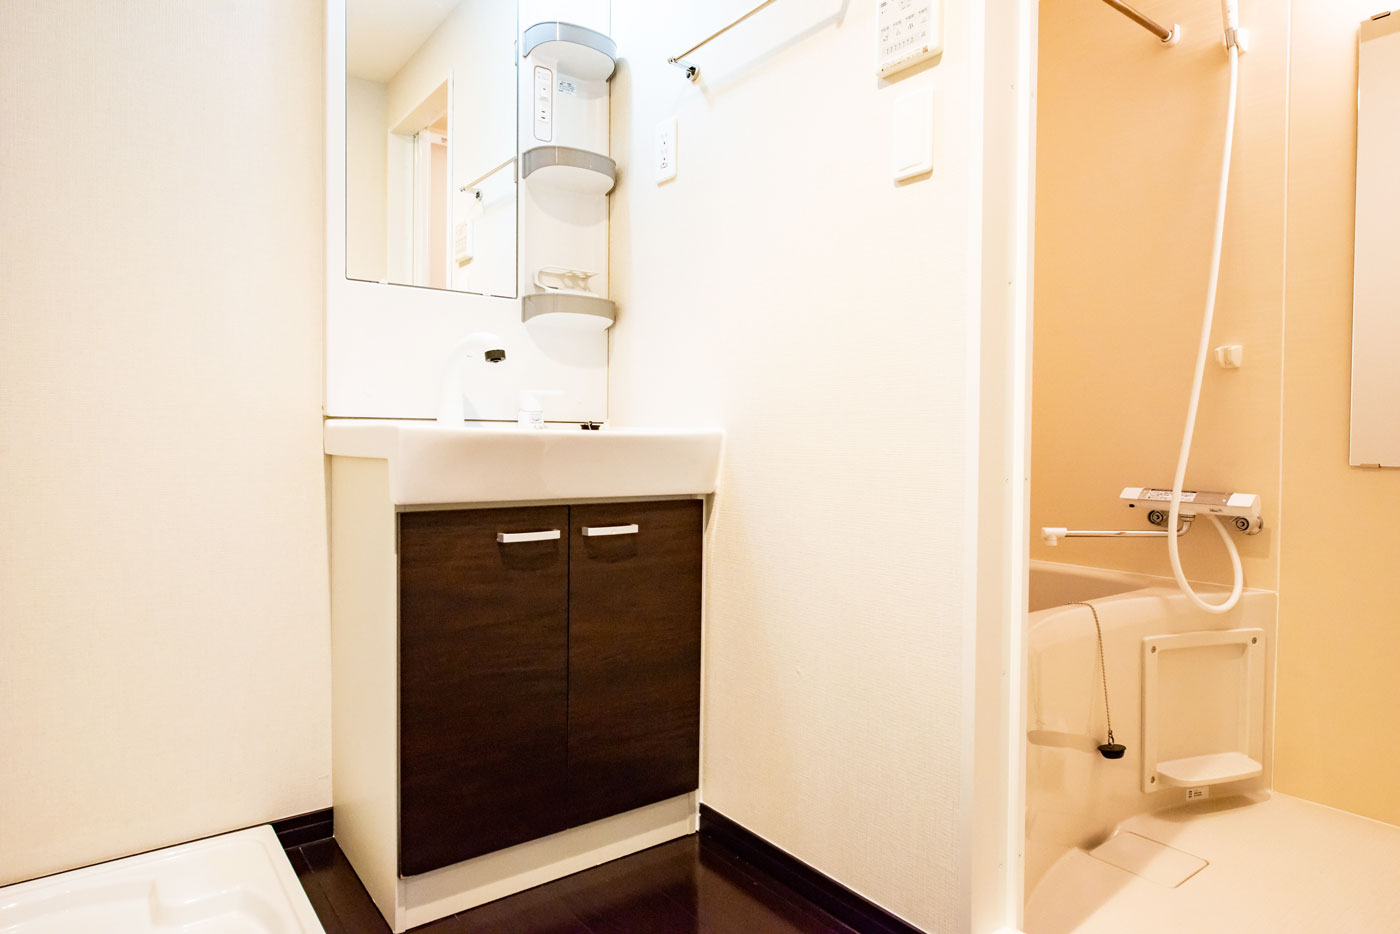 202-6 洗面室・浴室